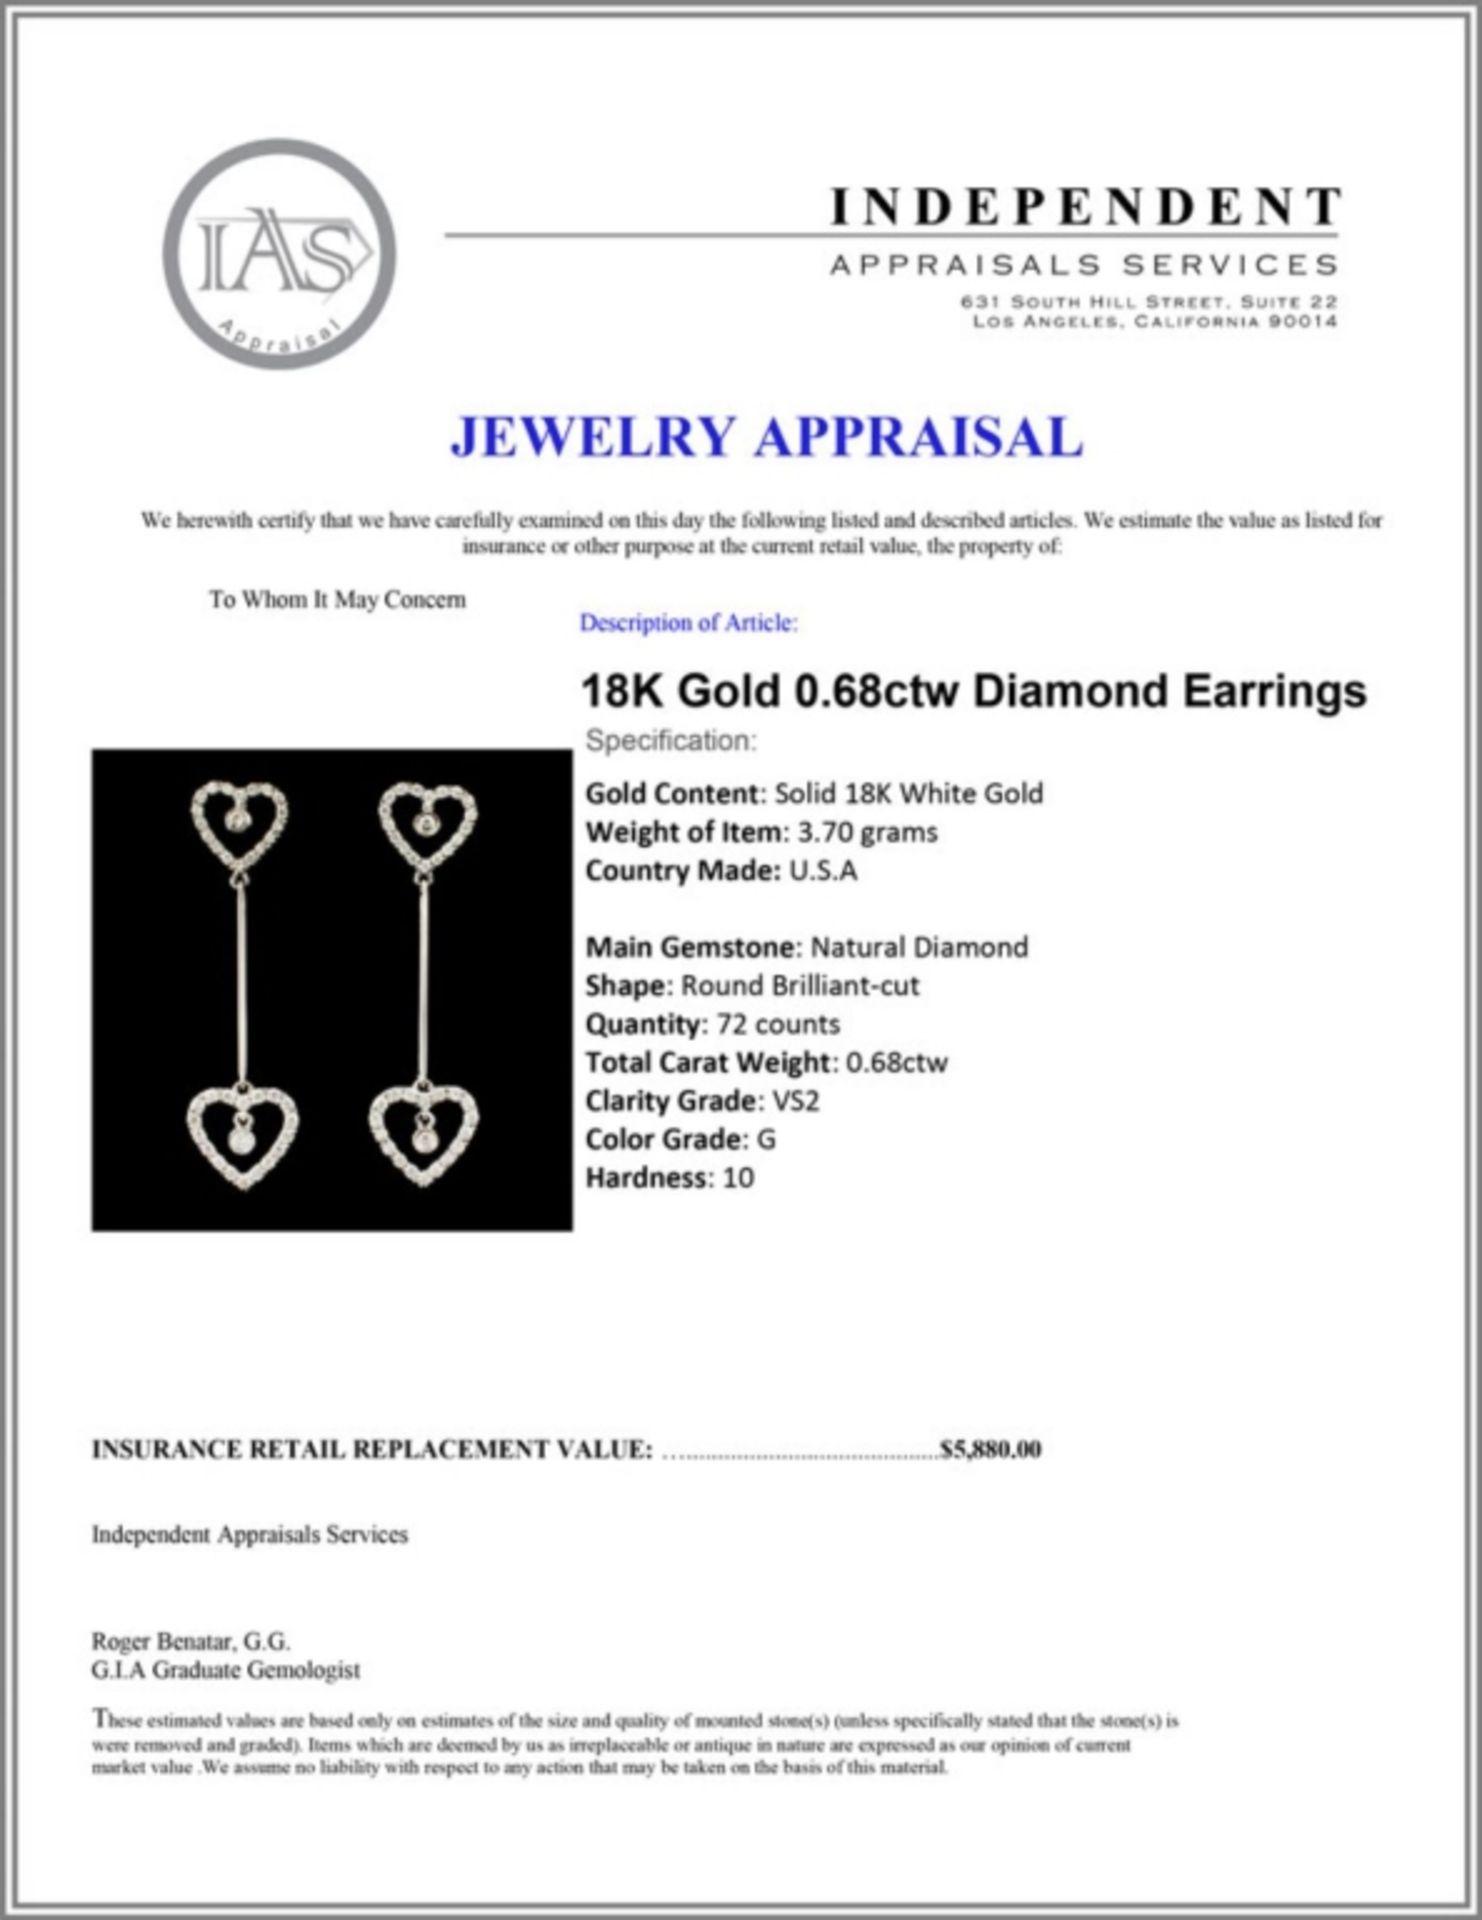 18K Gold 0.68ctw Diamond Earrings - Image 3 of 3